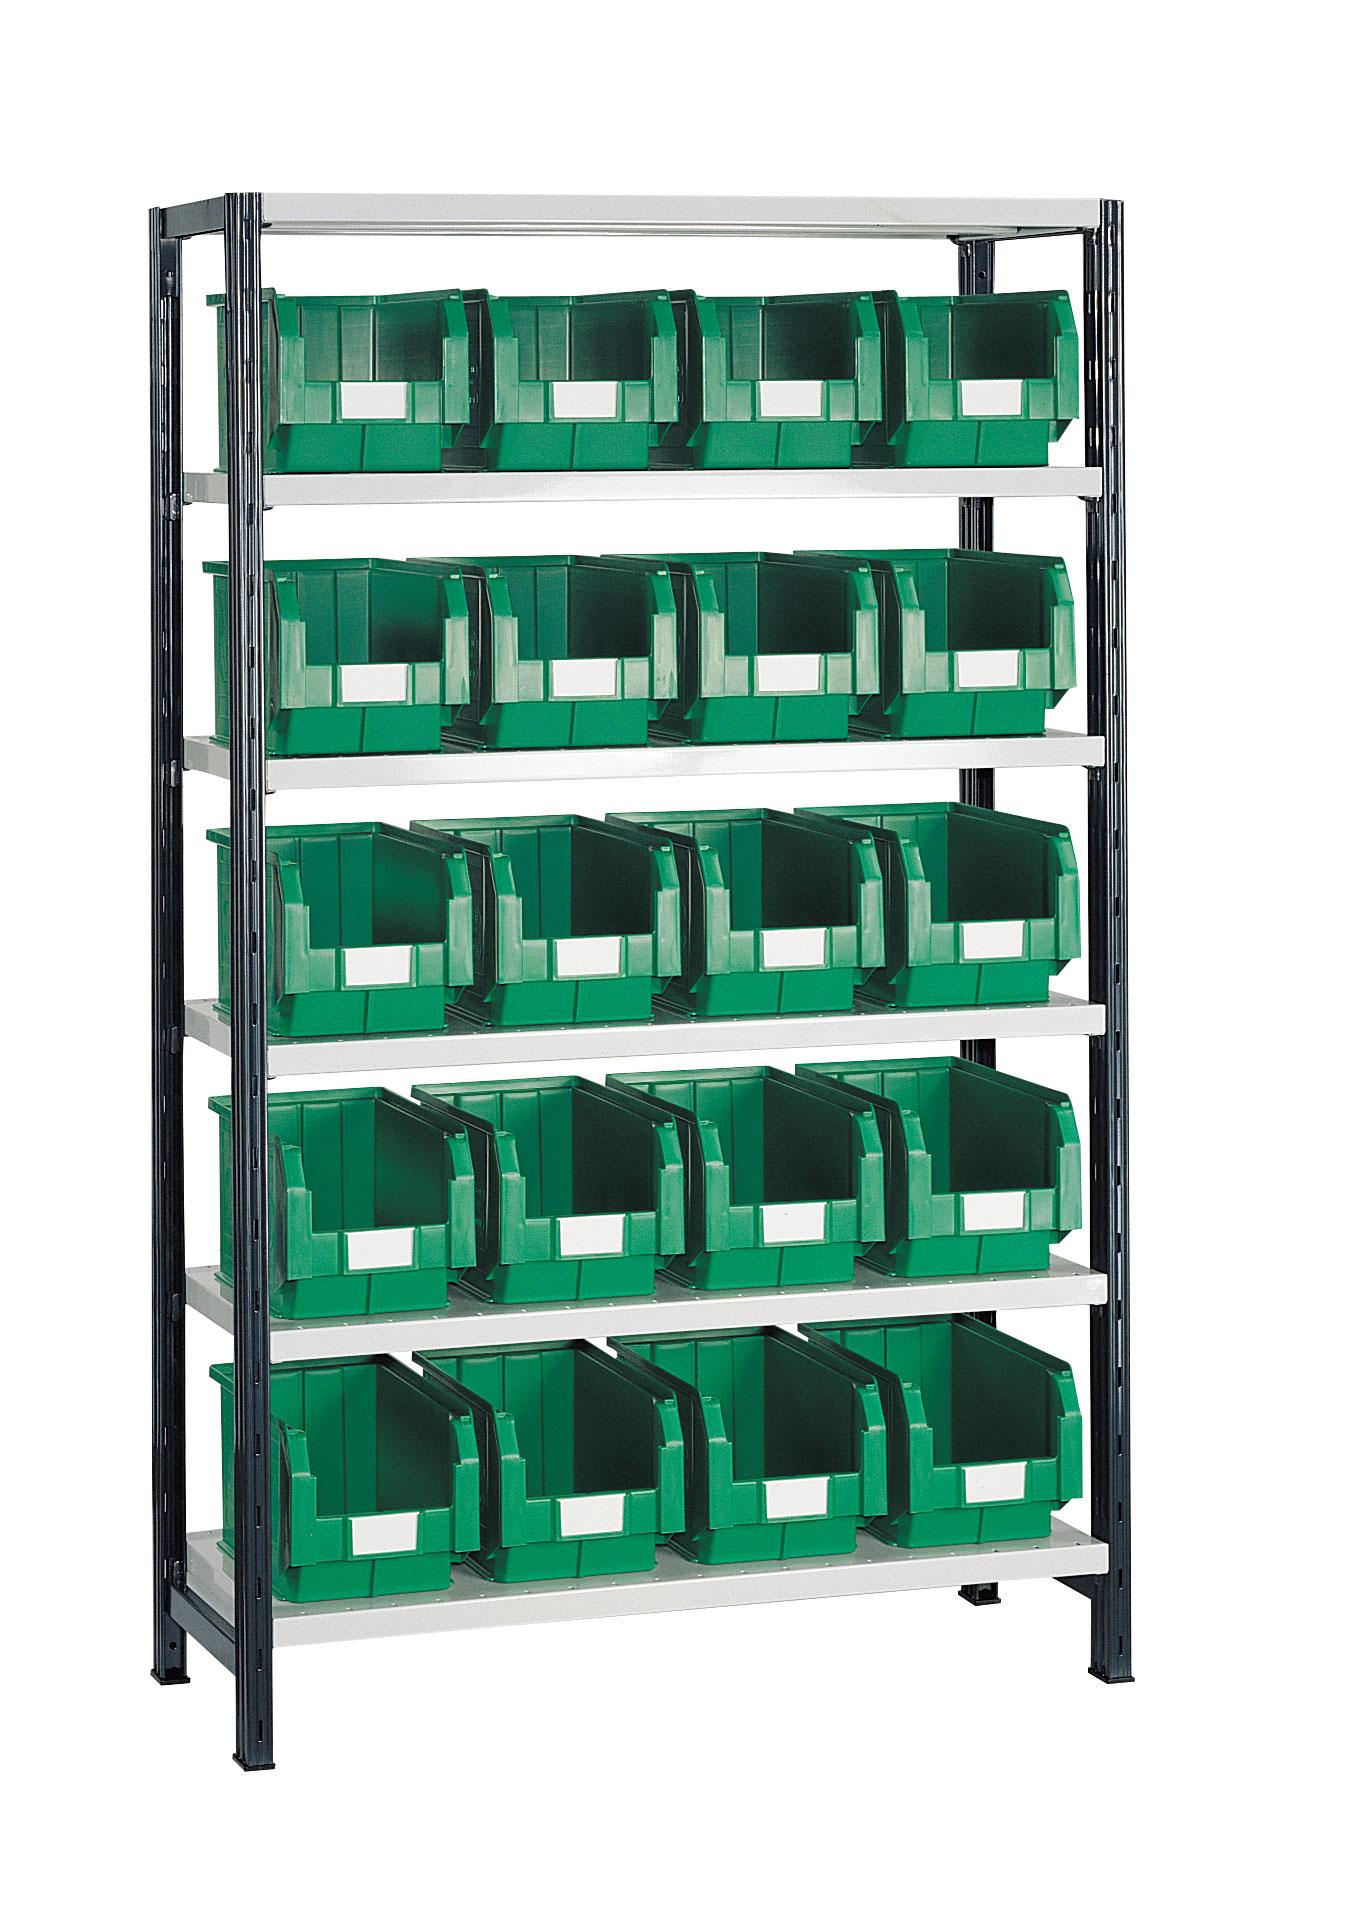 Rayonnage avec 20 bacs plastiques 12.5 litres verts